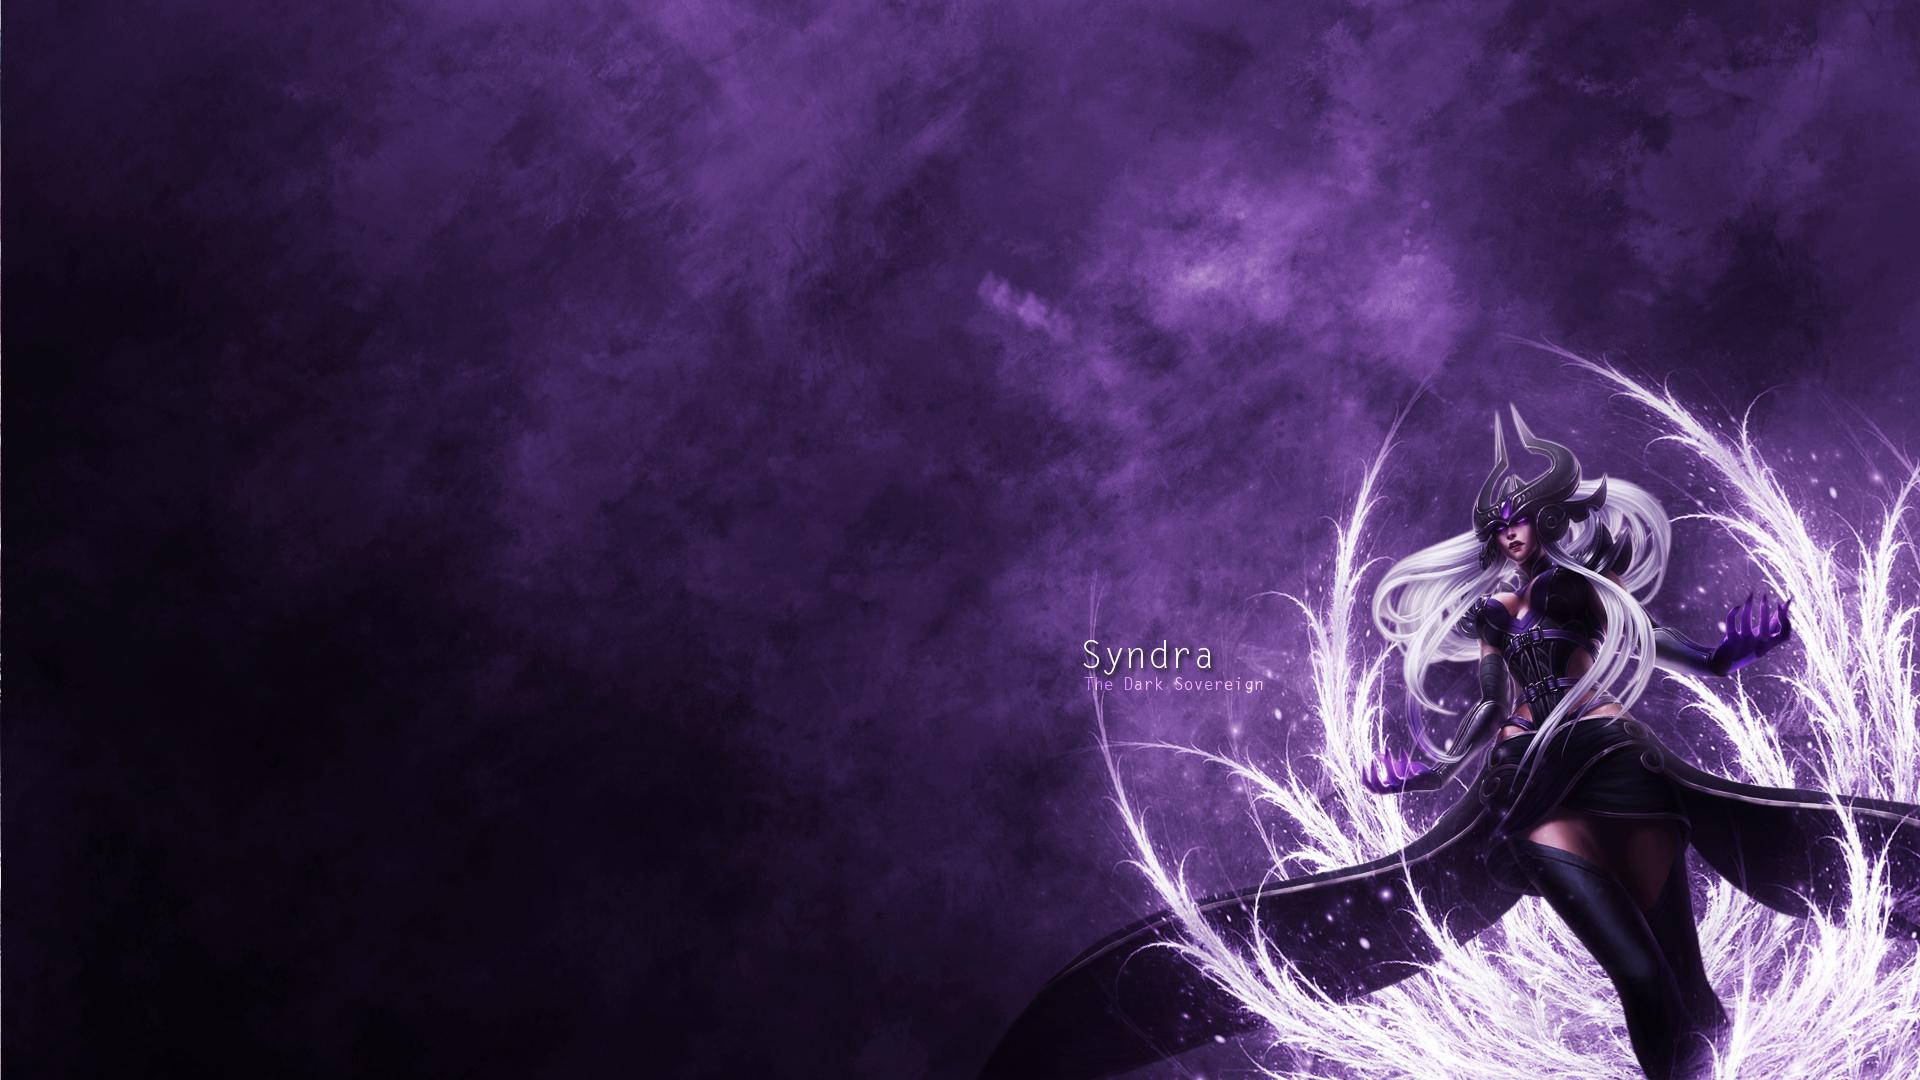 Syndra League of Legends on Pinterest | deviantART, League ...